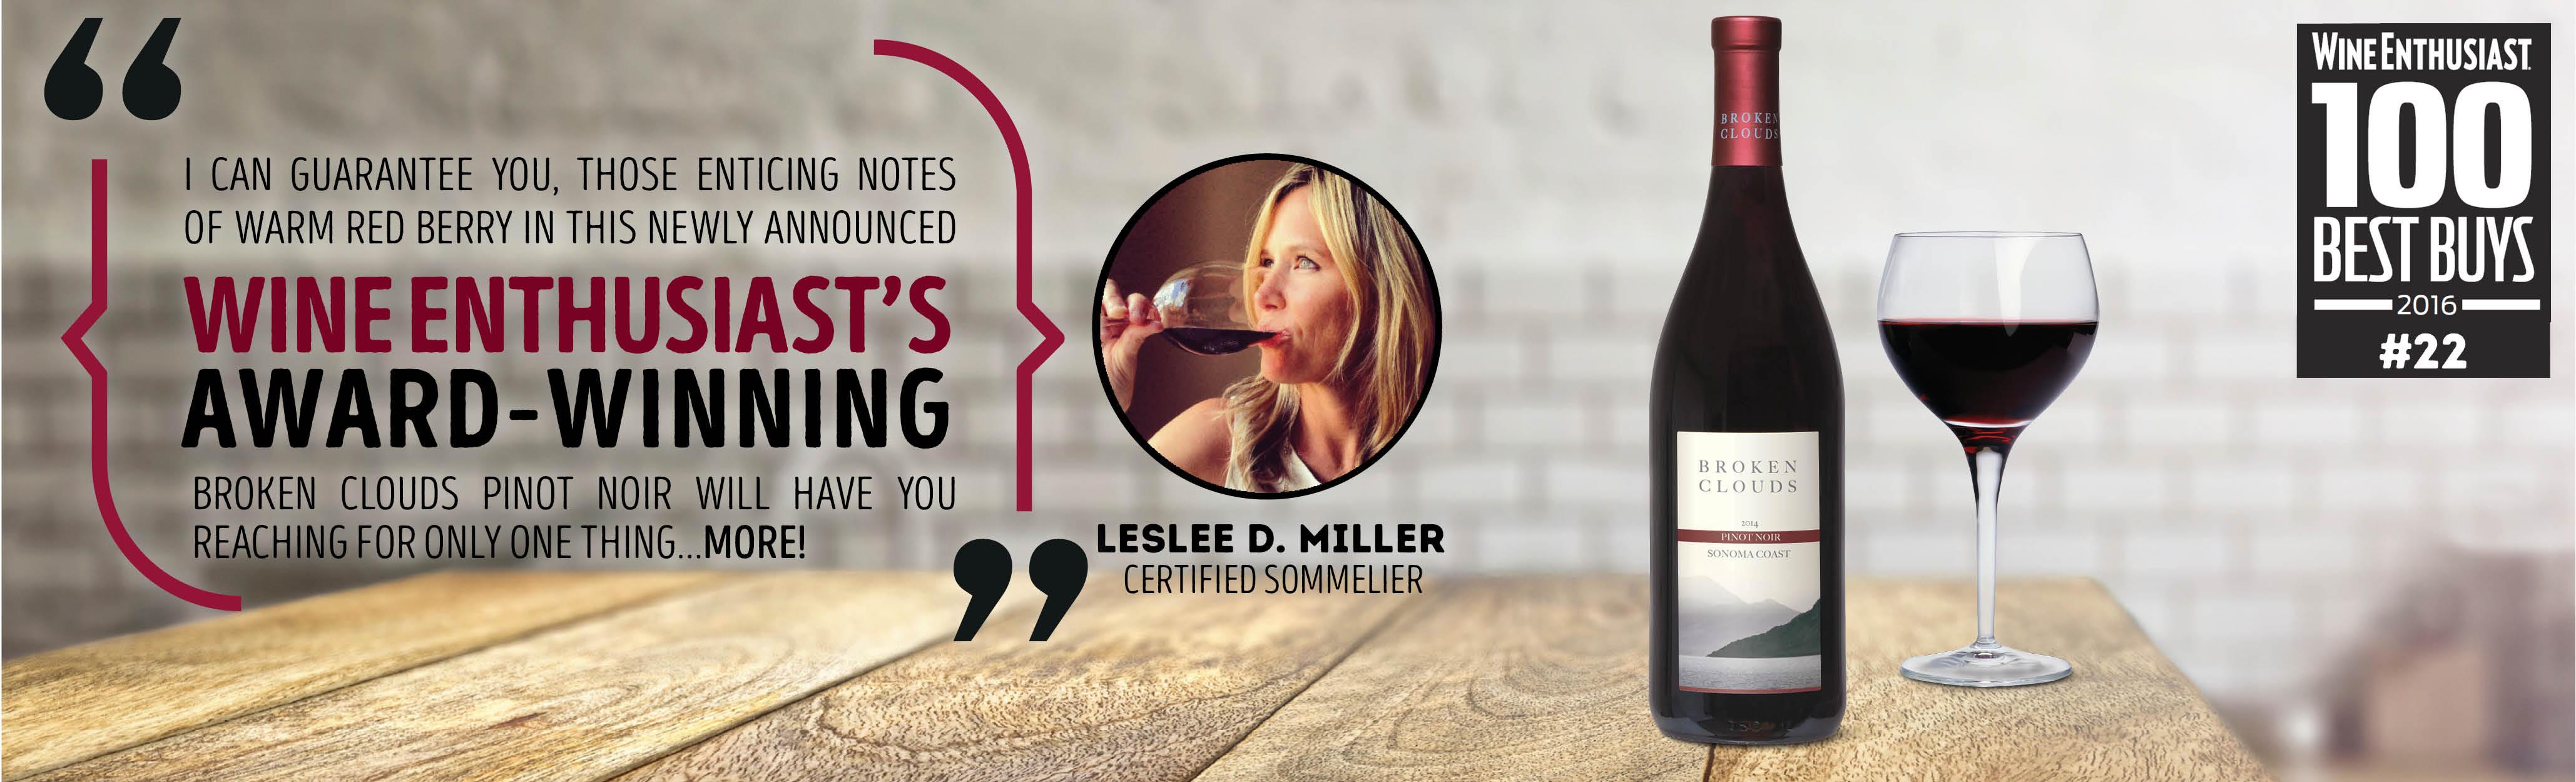 Sommelier Leslee Miller and Broken Cloud Pinot Noir recommendation.